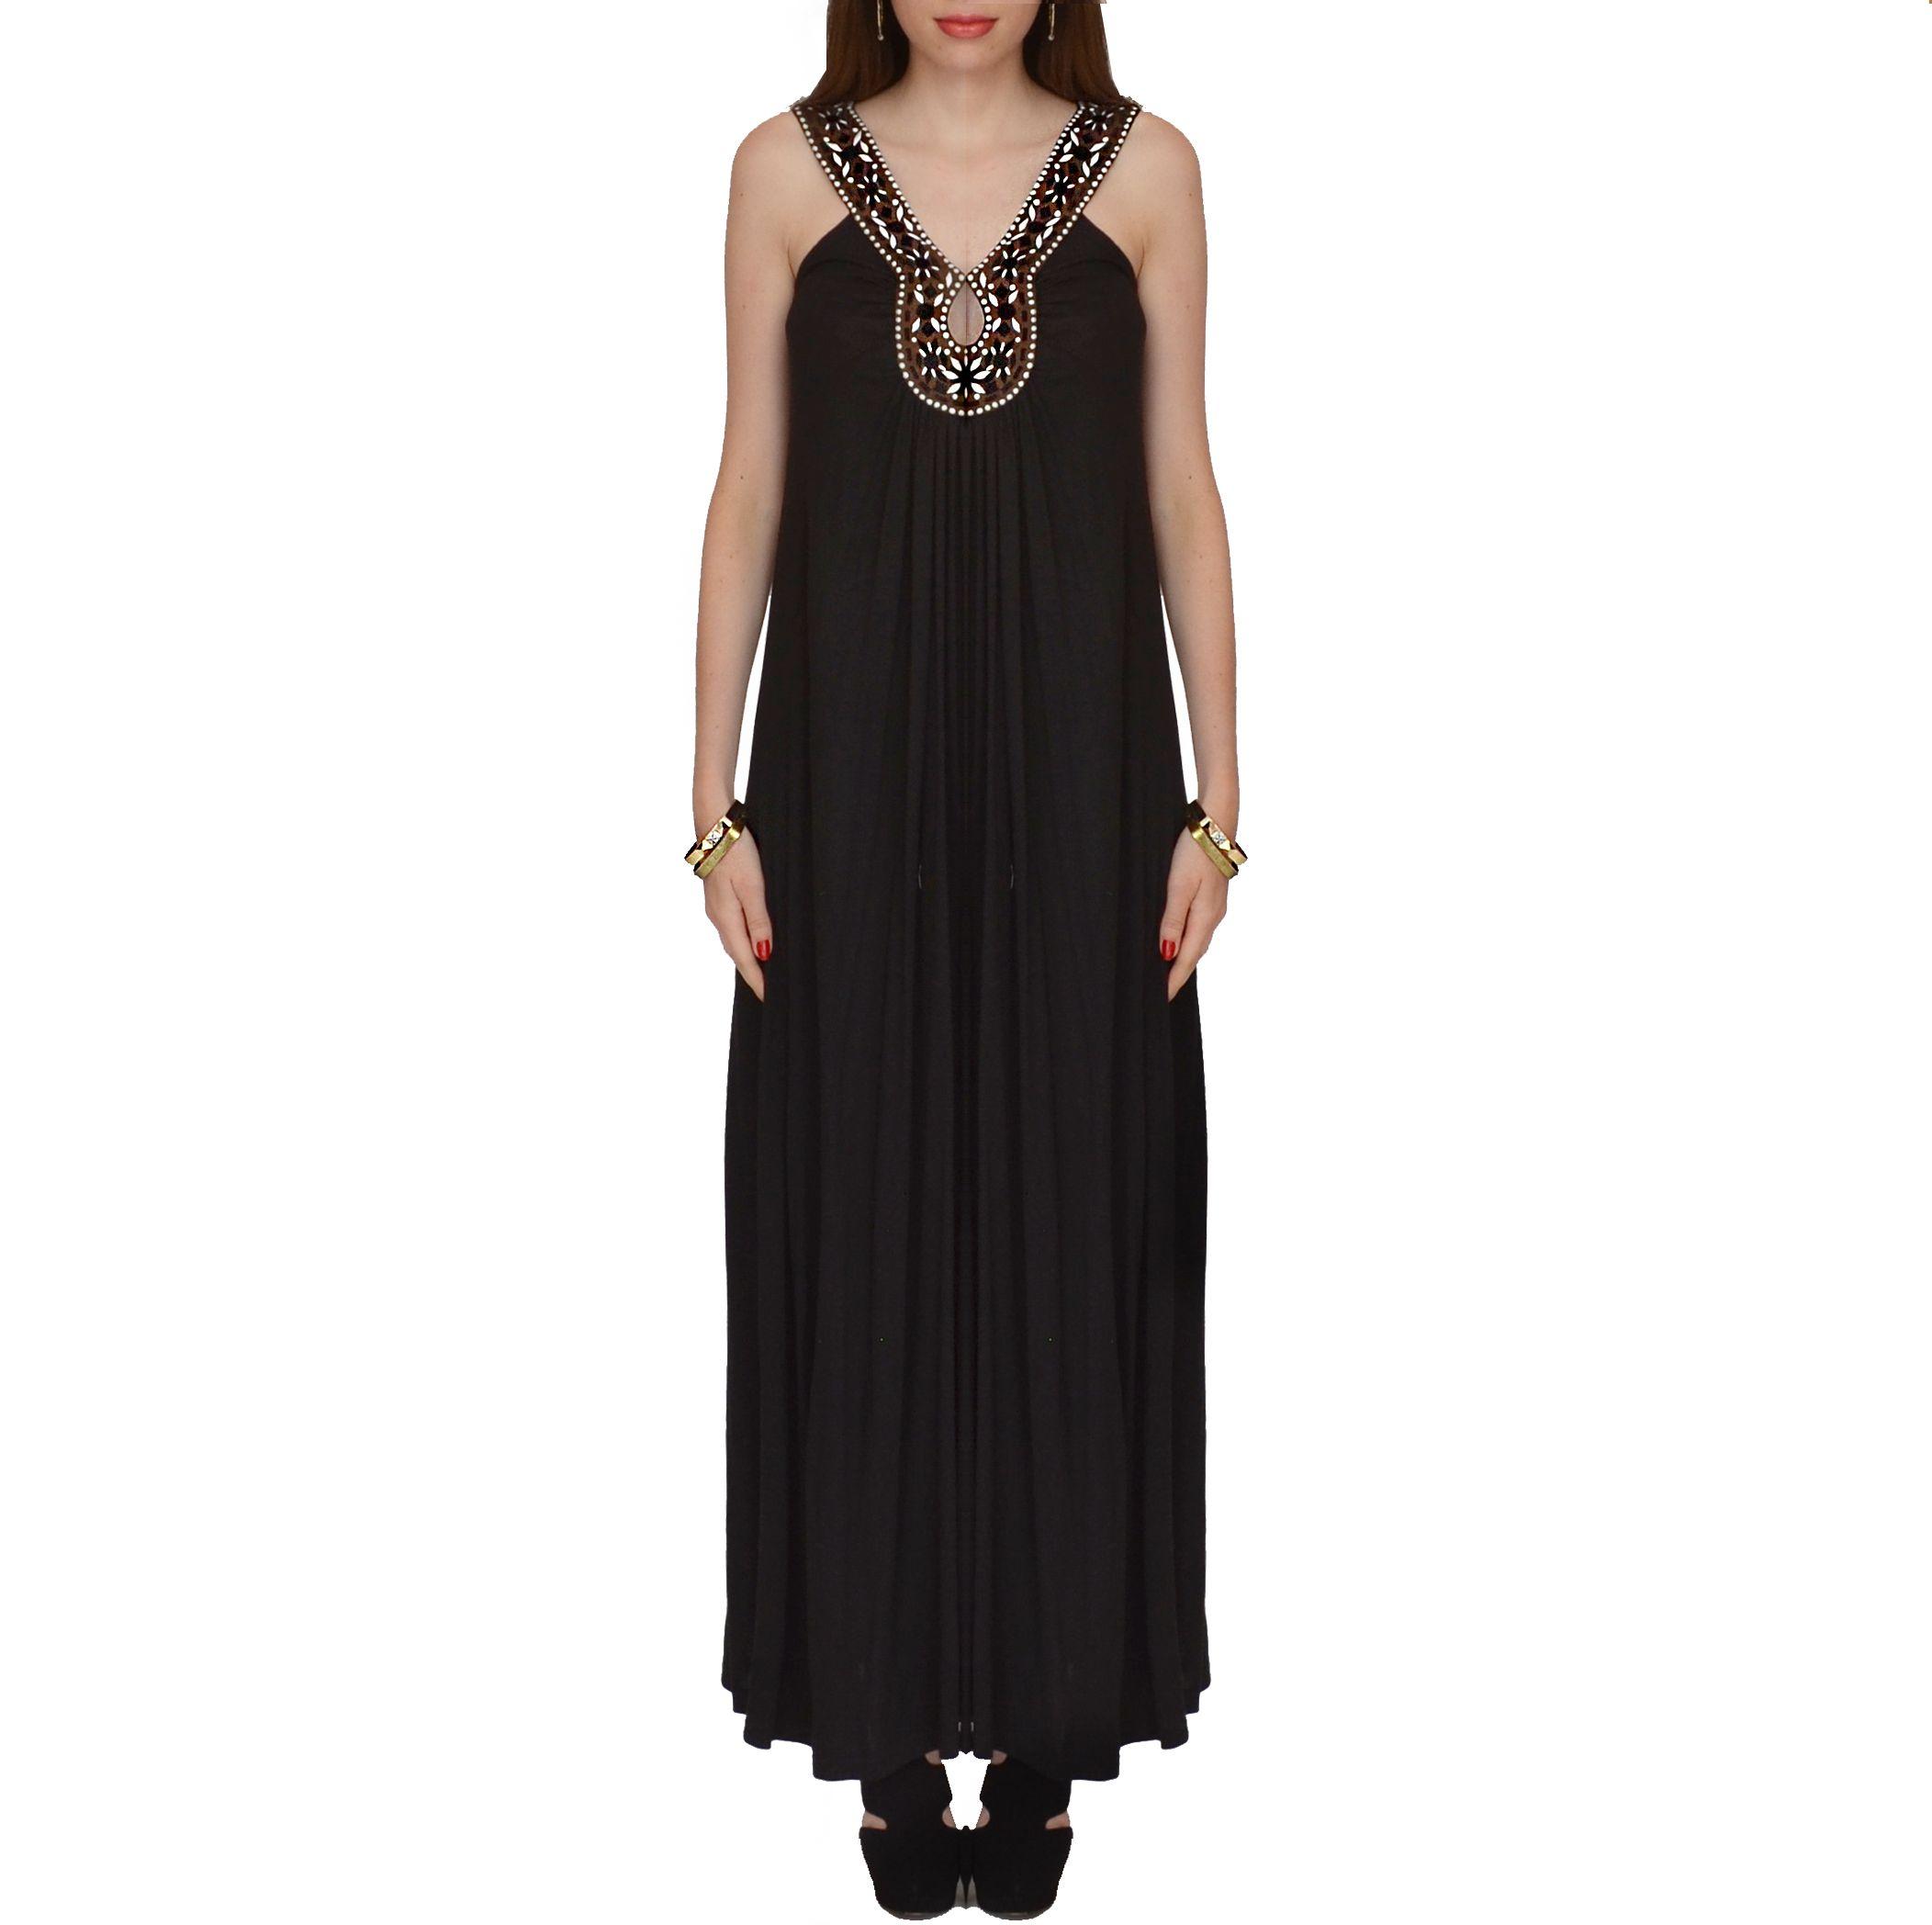 Belinda sleeveless black dress brown embroidery neck details